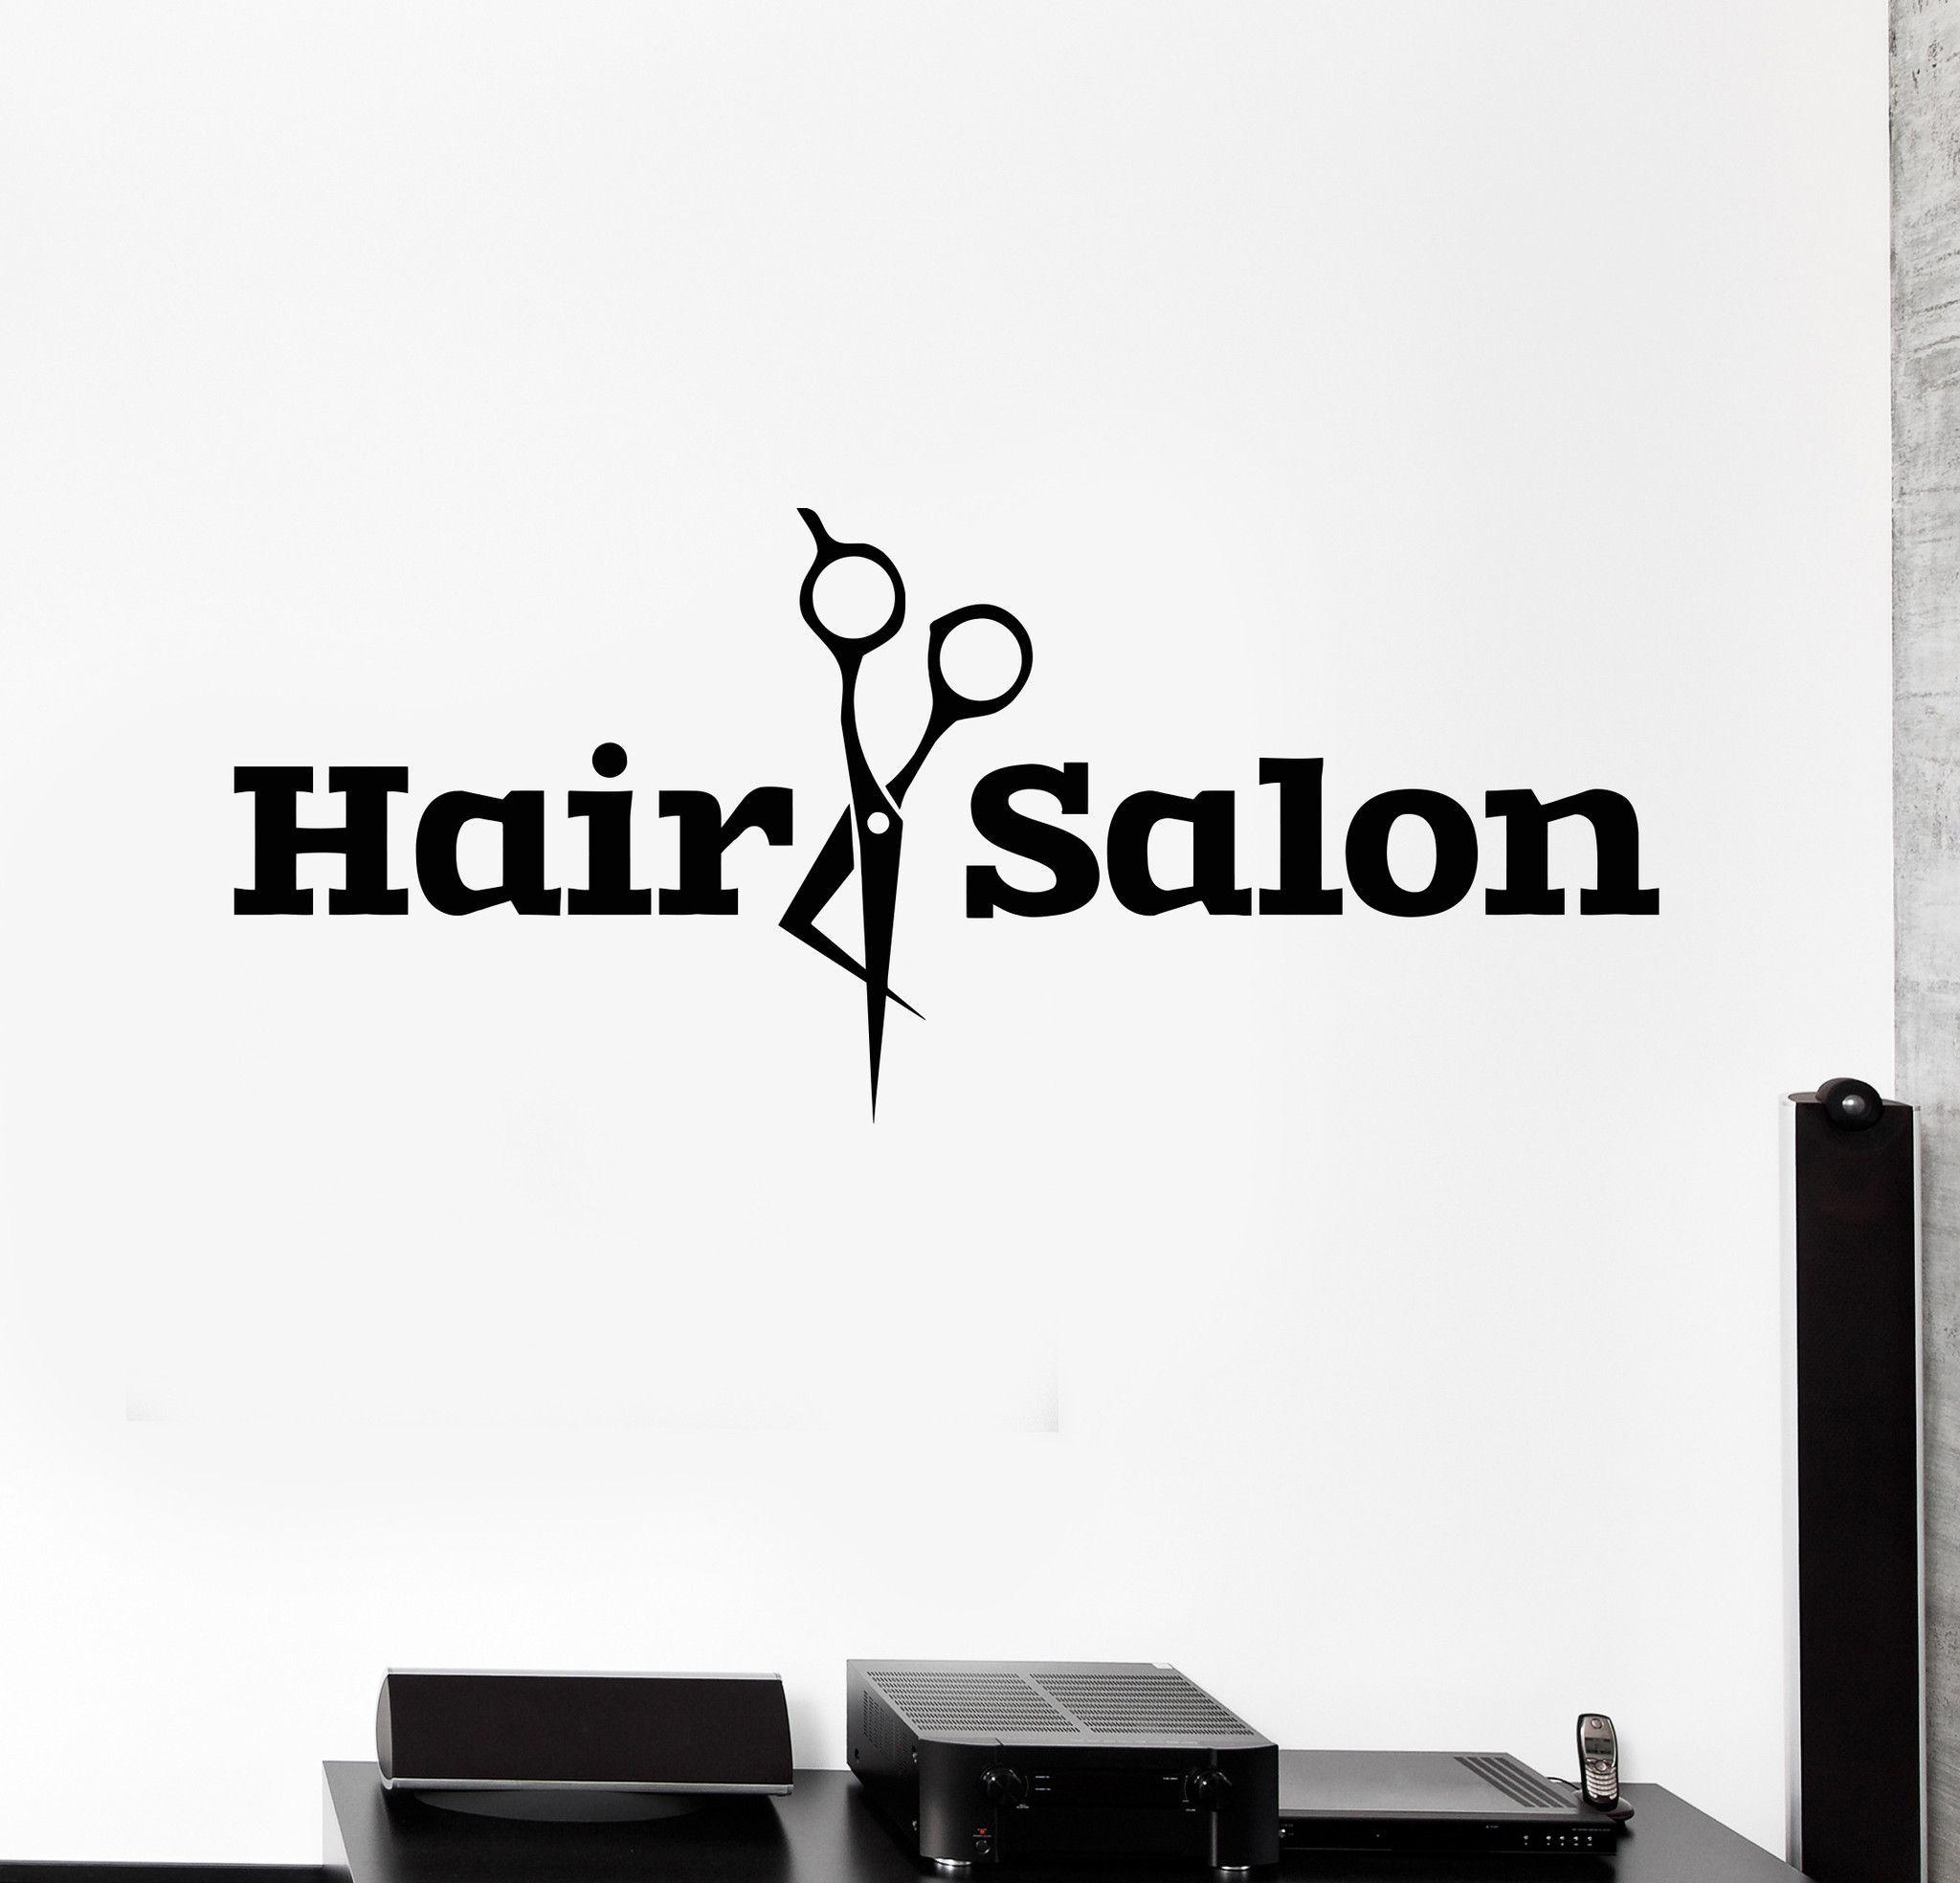 Vinyl Wall Decal Hair Salon Scissors Barbershop Stylist Stickers - Where to get vinyl stickers made